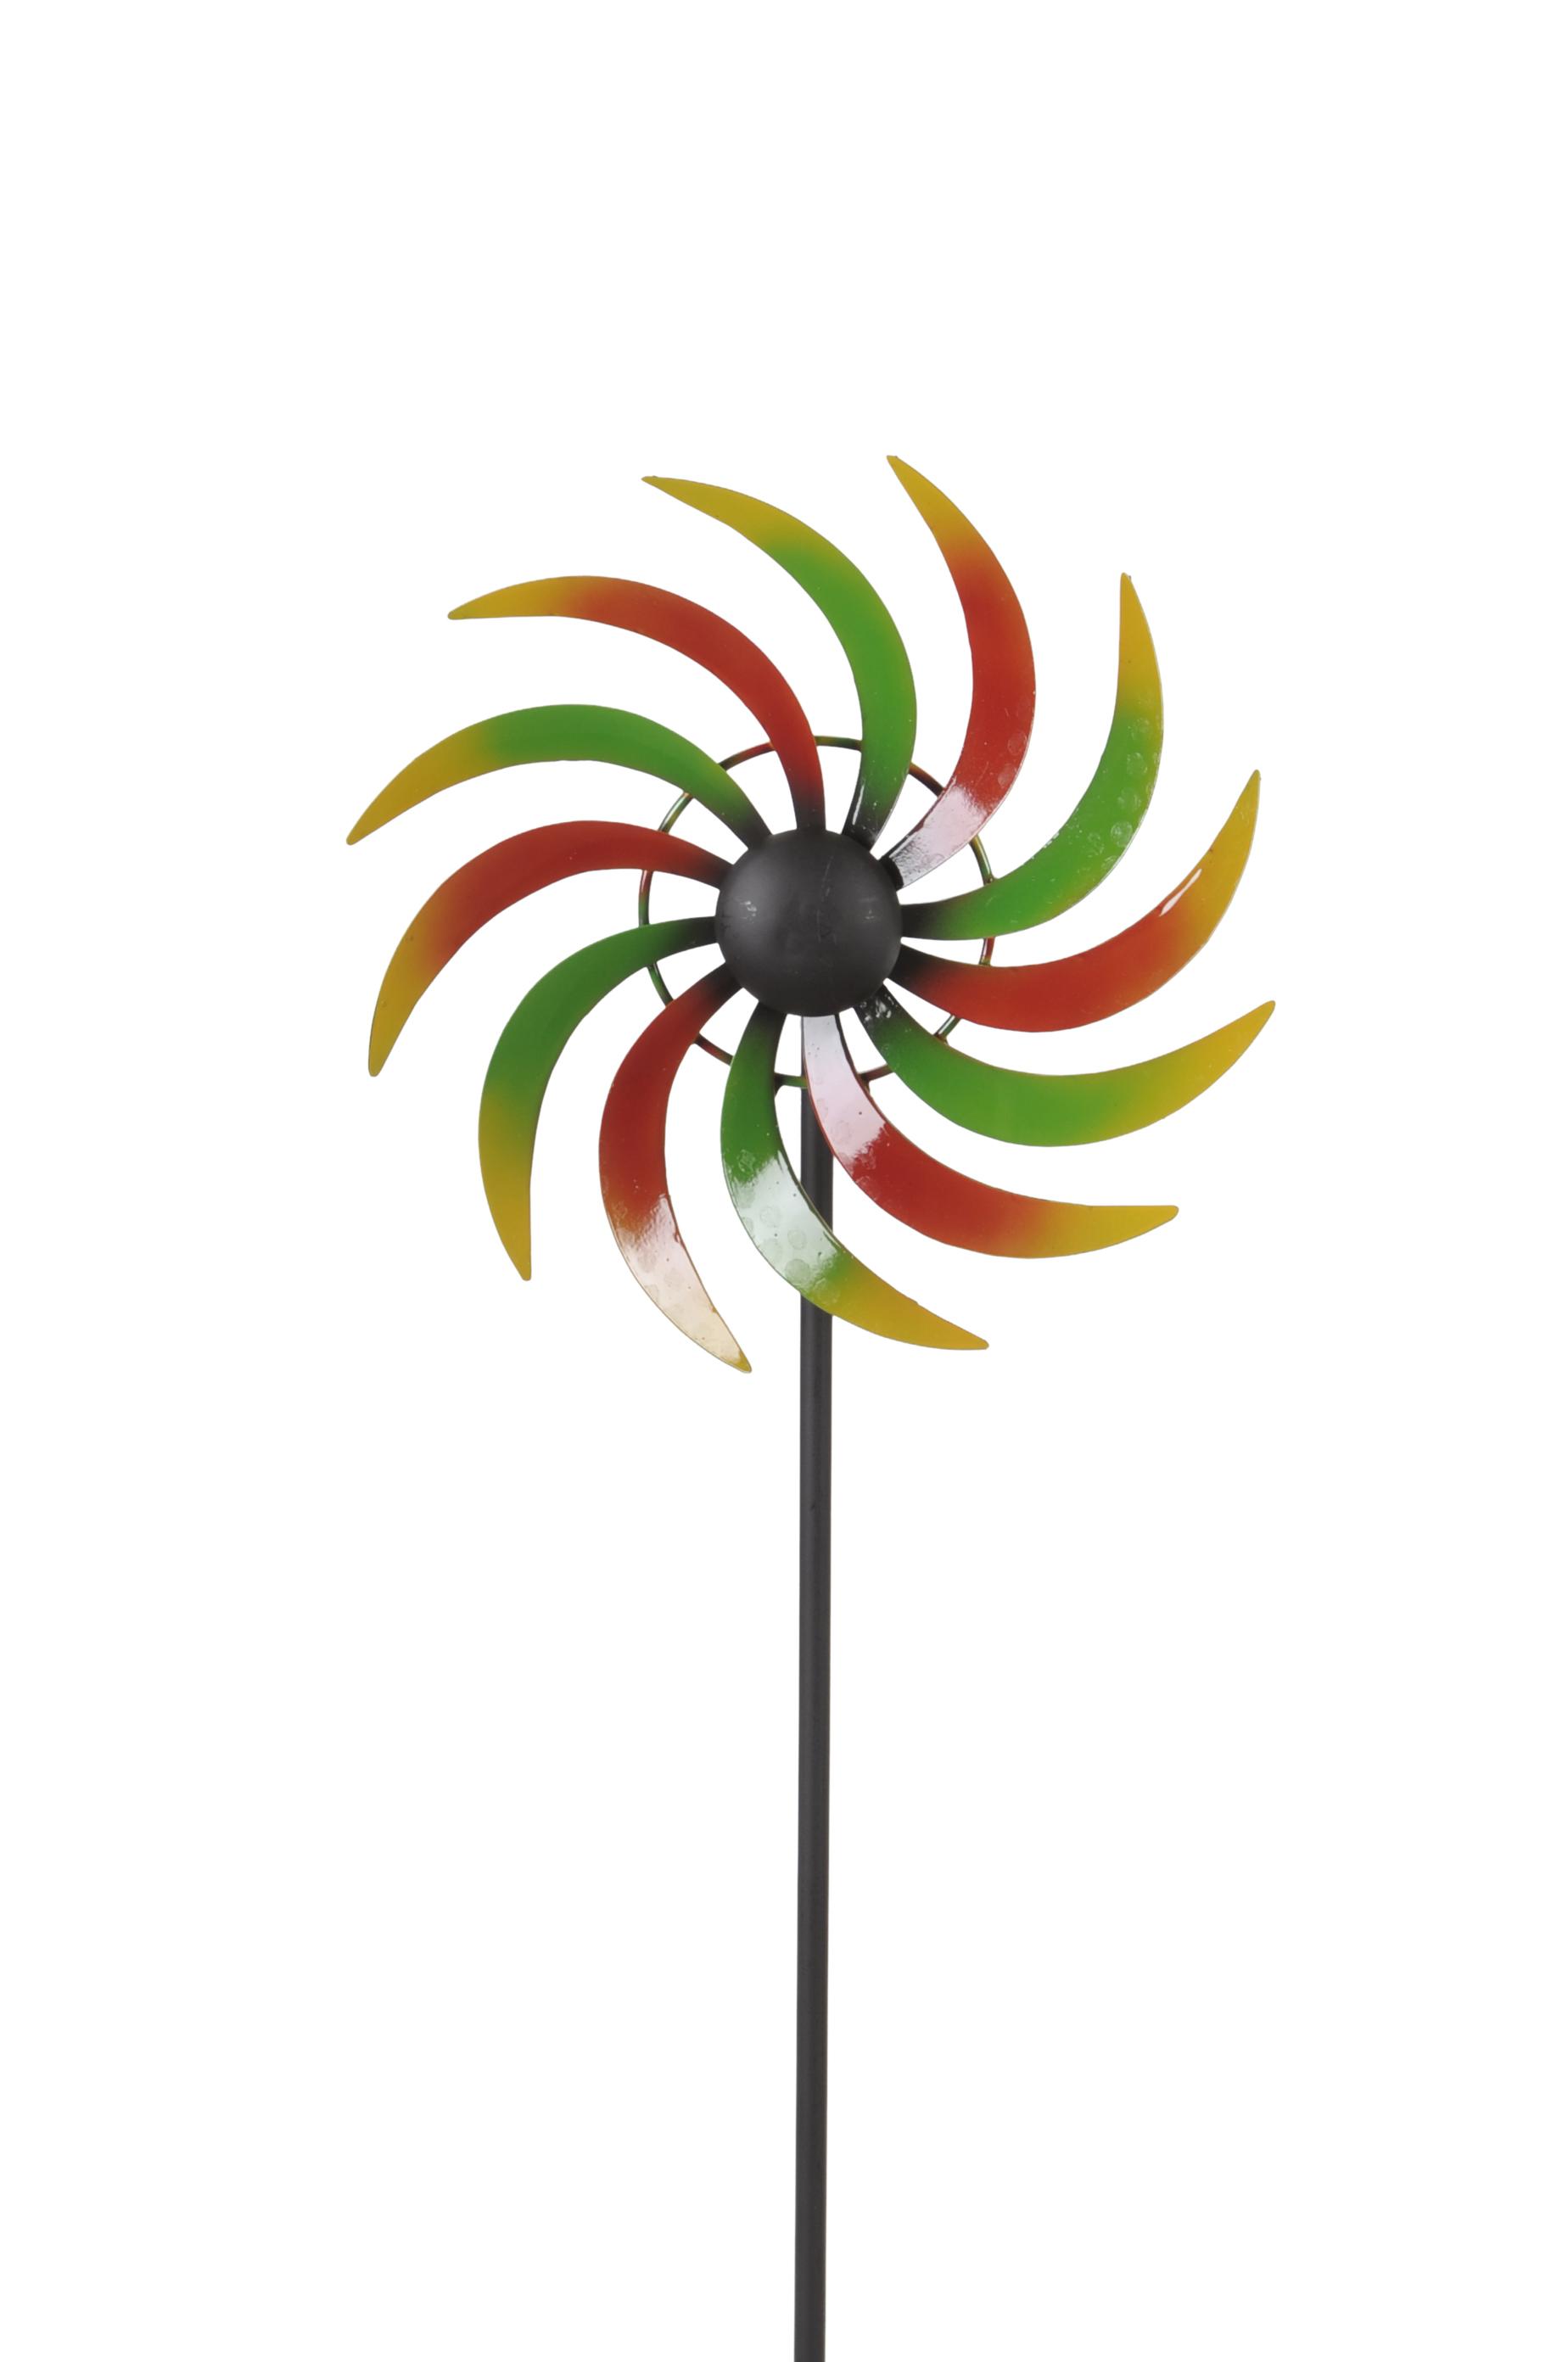 Halterung Balkon-Windrad Windspiel Windmühle Garten-Deko Schmetterling inkl